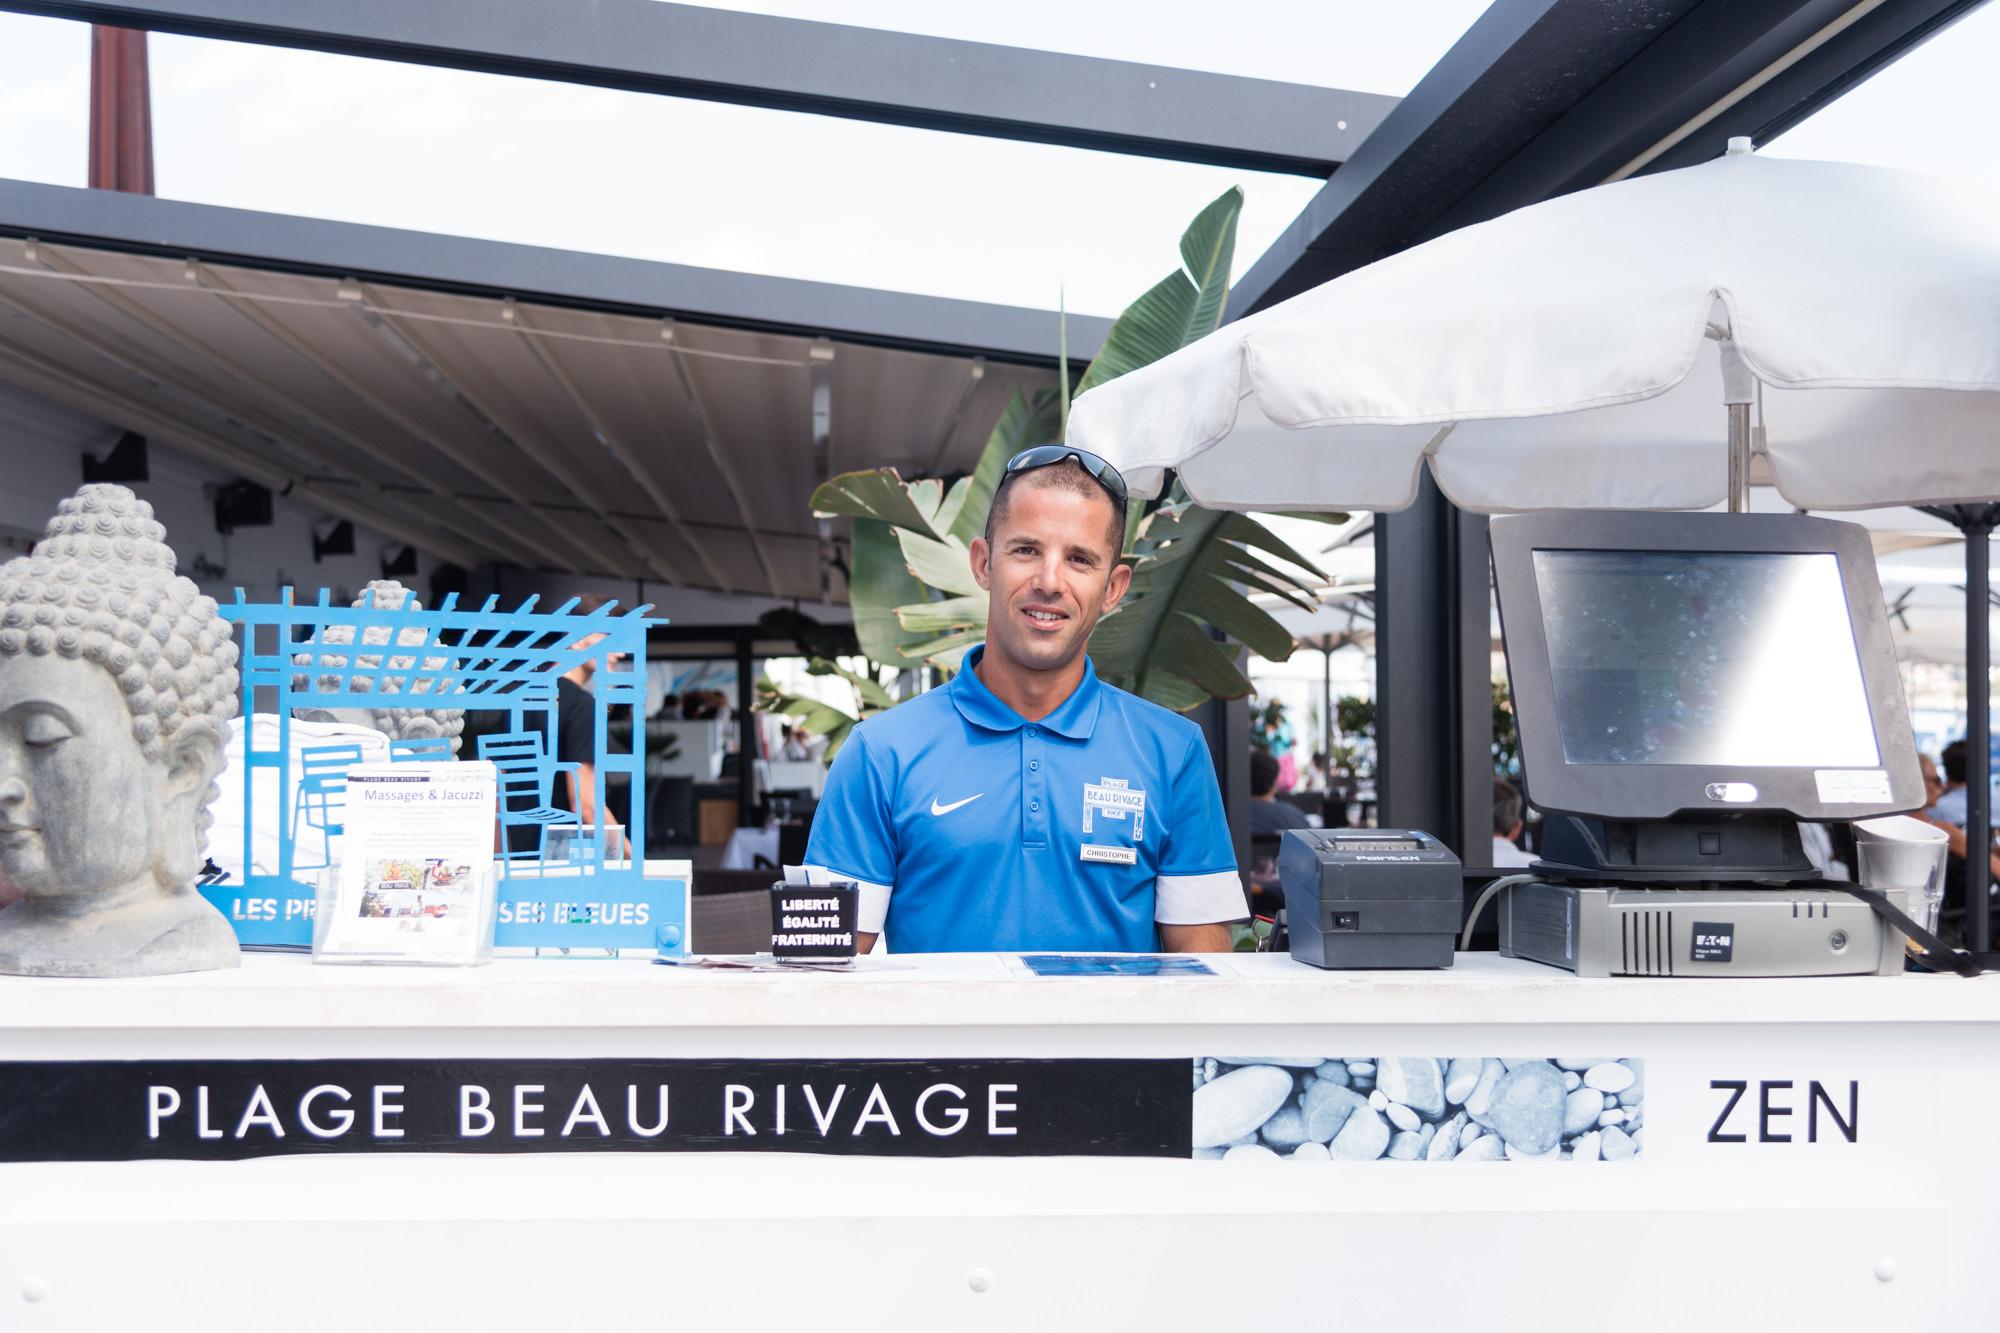 Plage Beau Rivage Nice-1031